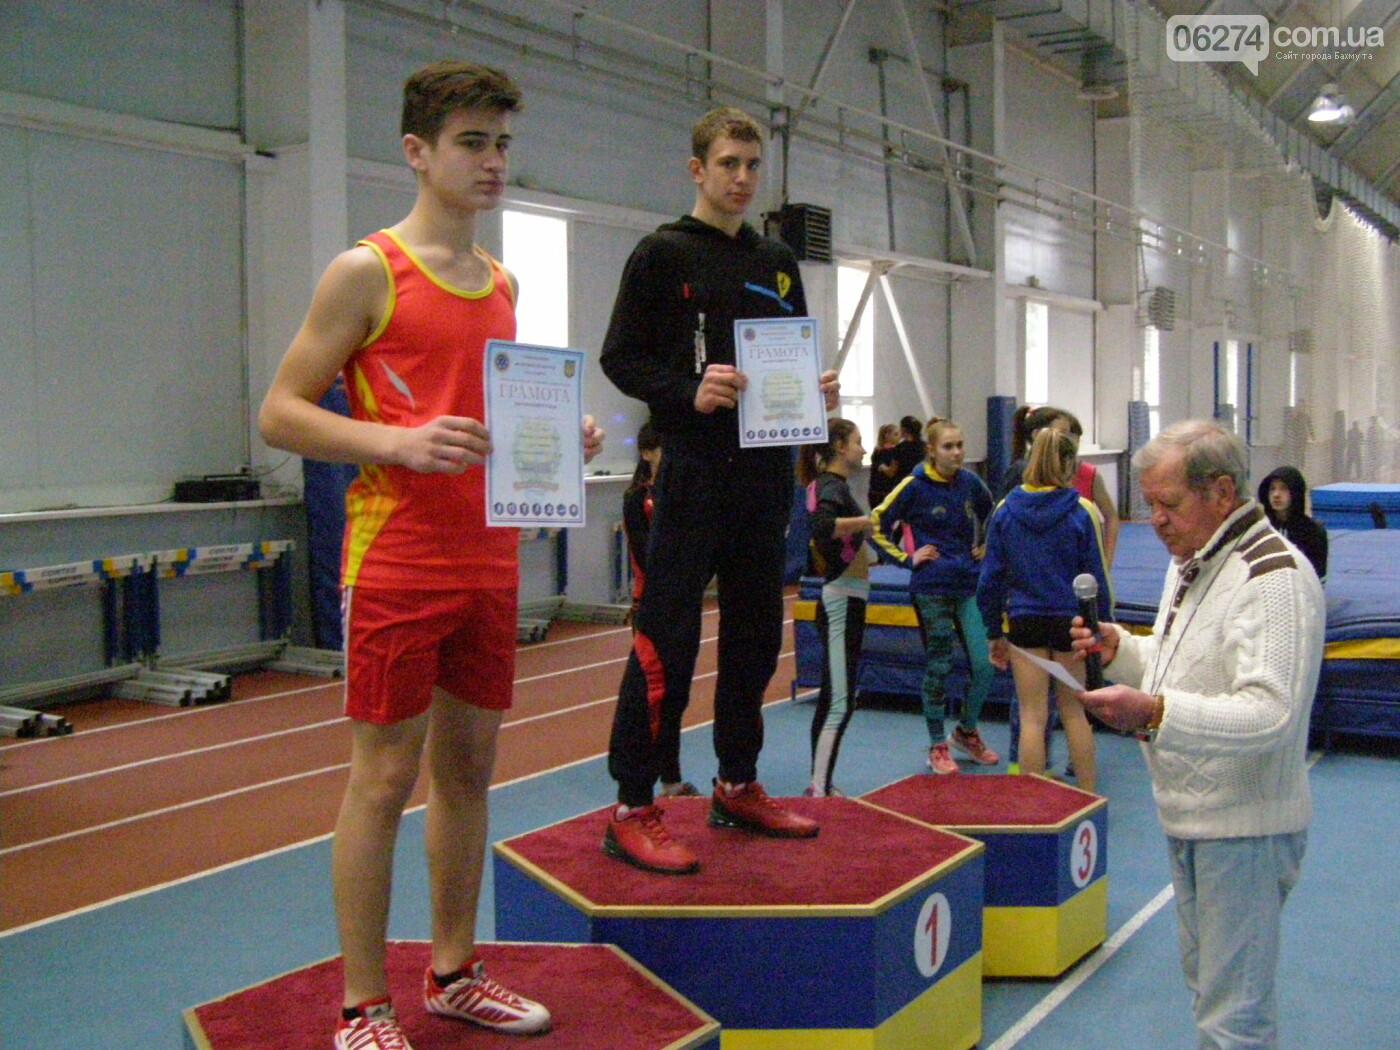 Бахмут принял чемпионат Донецкой области по легкой атлетике , фото-4